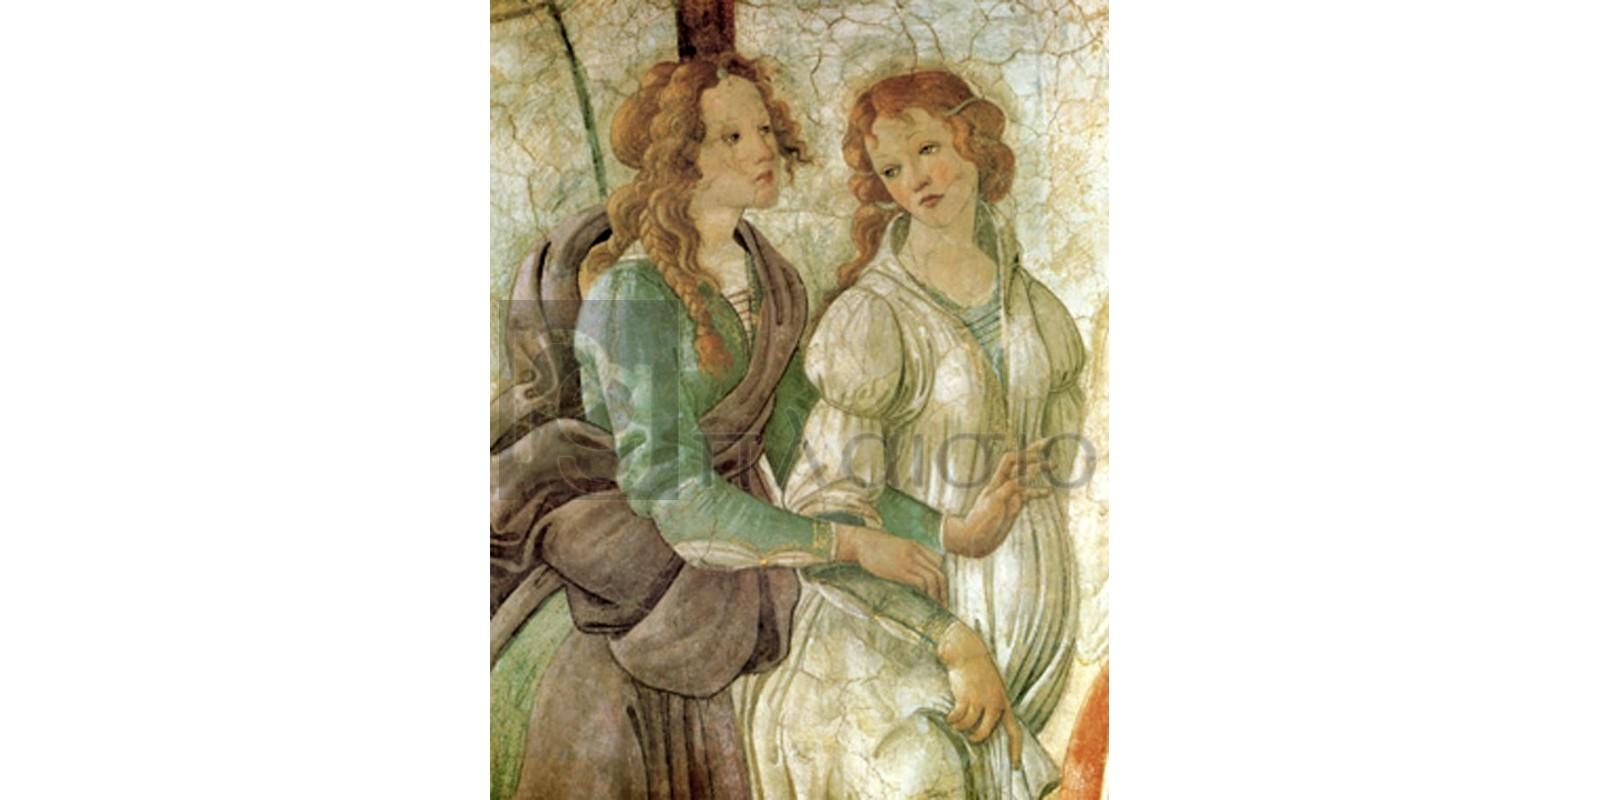 Sandro Botticelli - Venere offre doni (part)